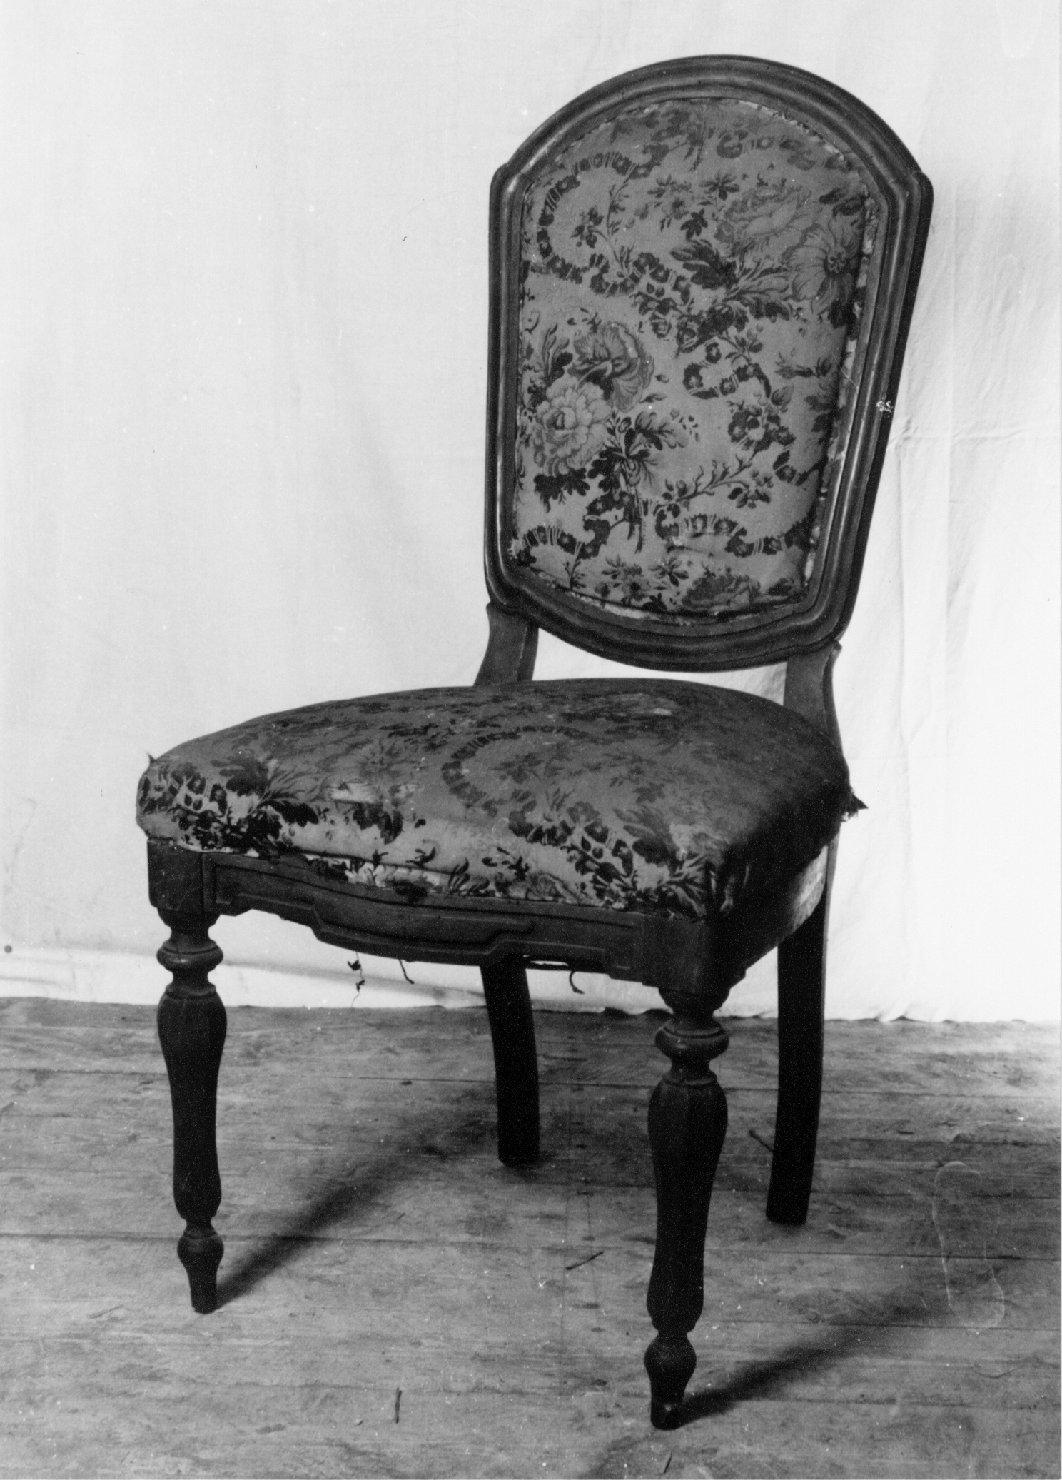 sedia, serie - manifattura lombardo-veneta (metà sec. XIX)